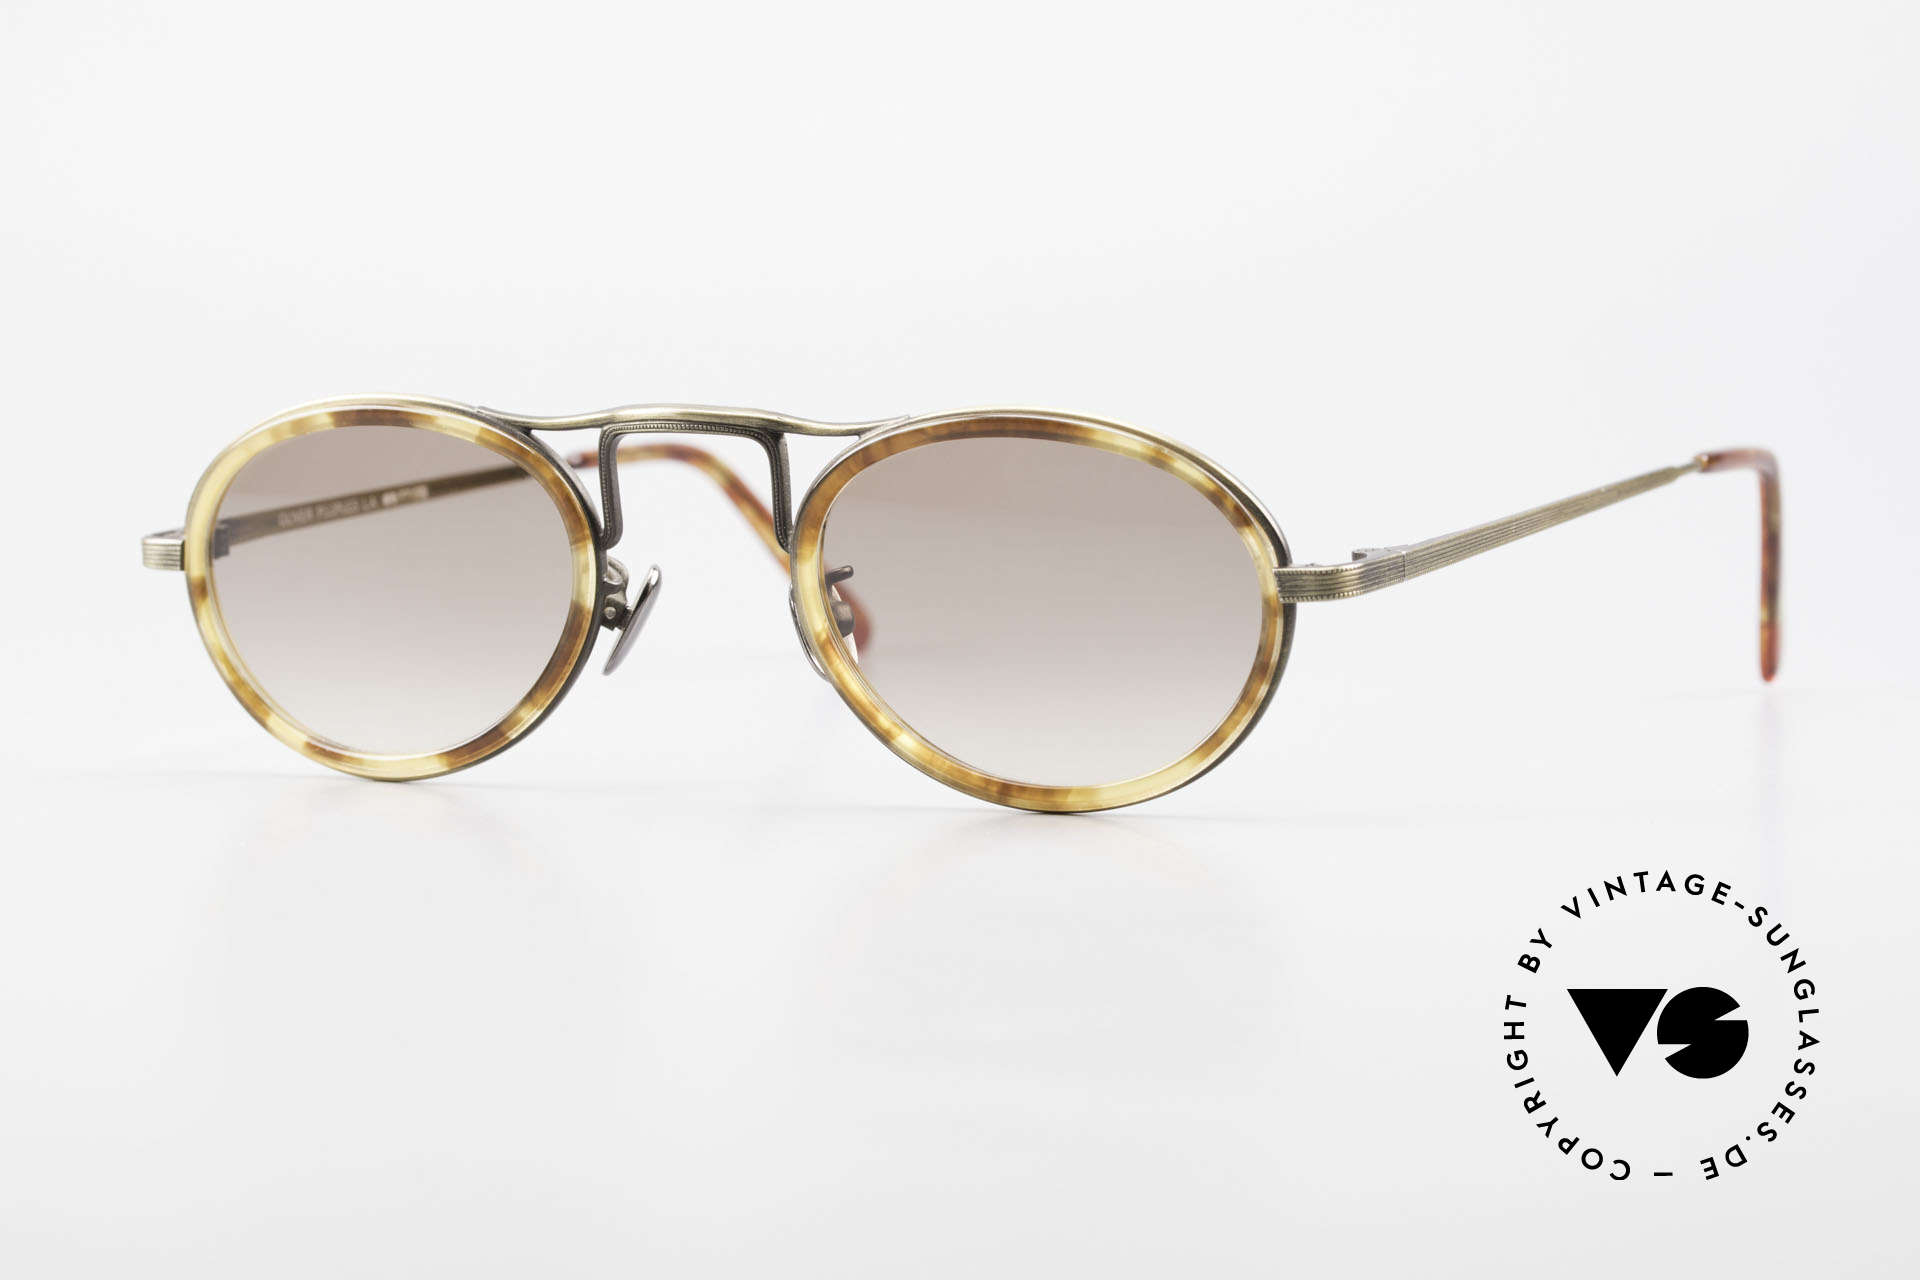 Oliver Peoples MP1 Vintage Designer Frame Oval, vintage Oliver Peoples sunglasses from the late 1990's, Made for Men and Women